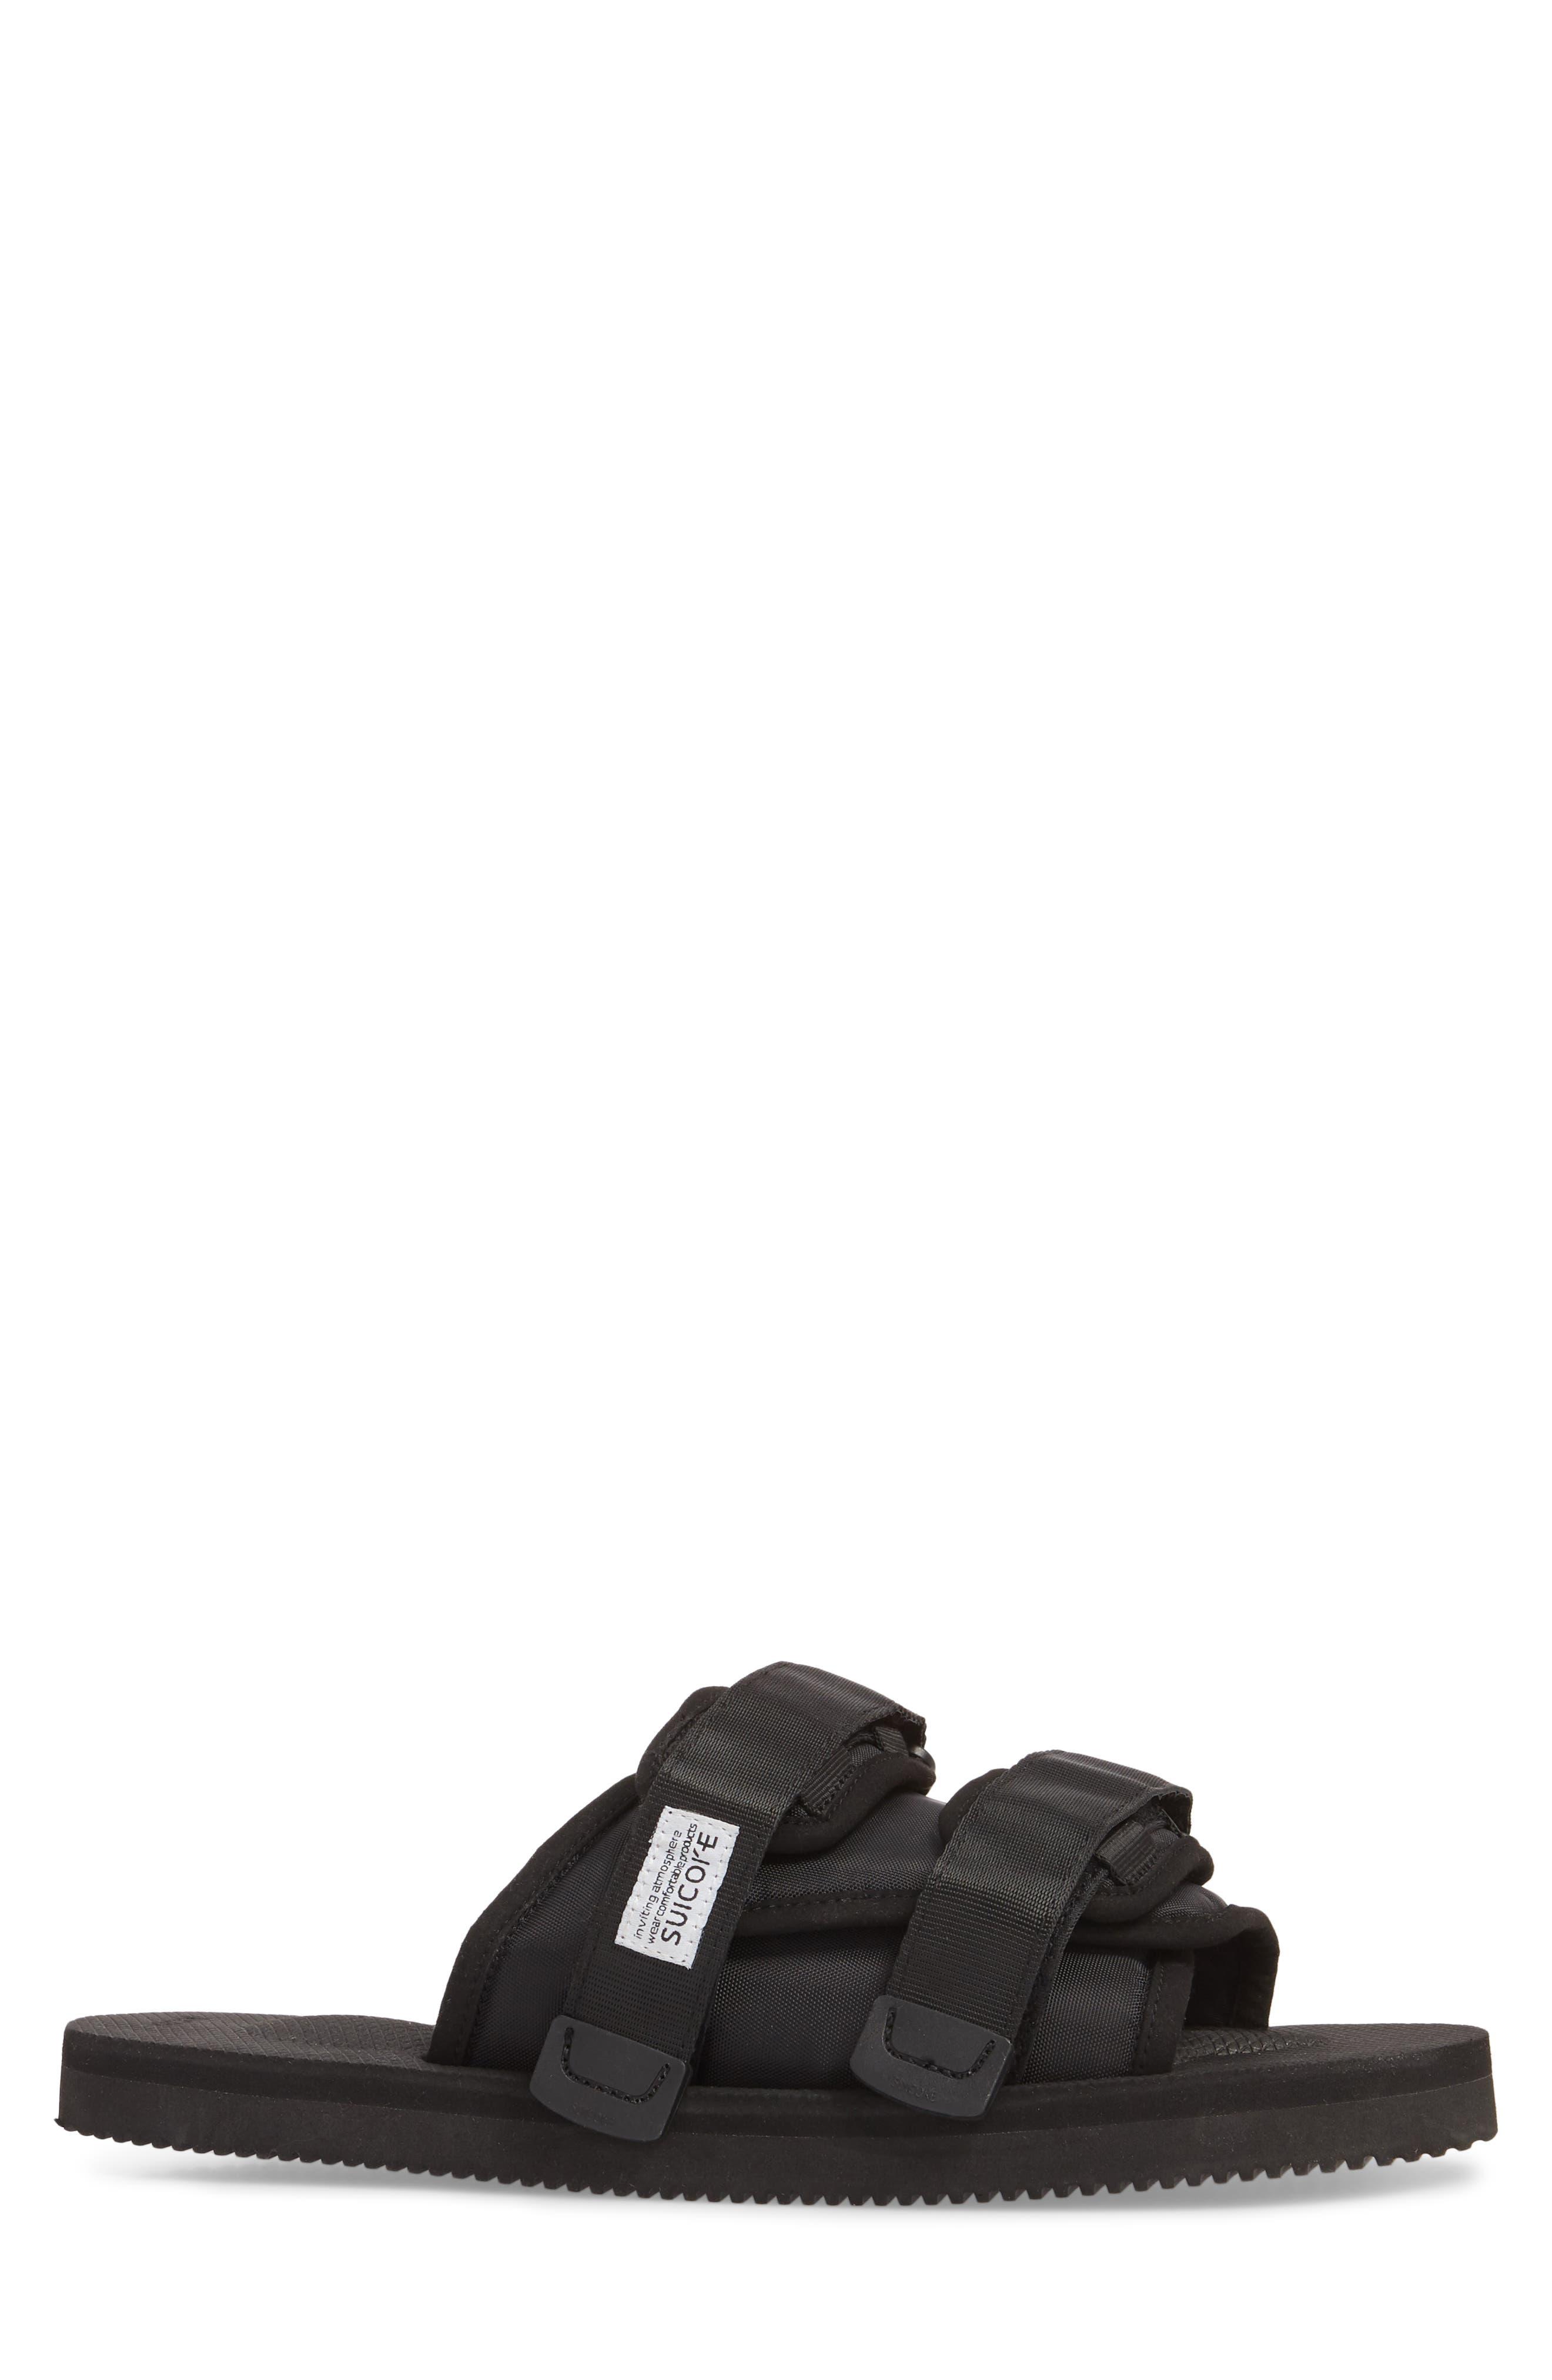 Moto Cab Slide Sandal,                             Alternate thumbnail 3, color,                             001